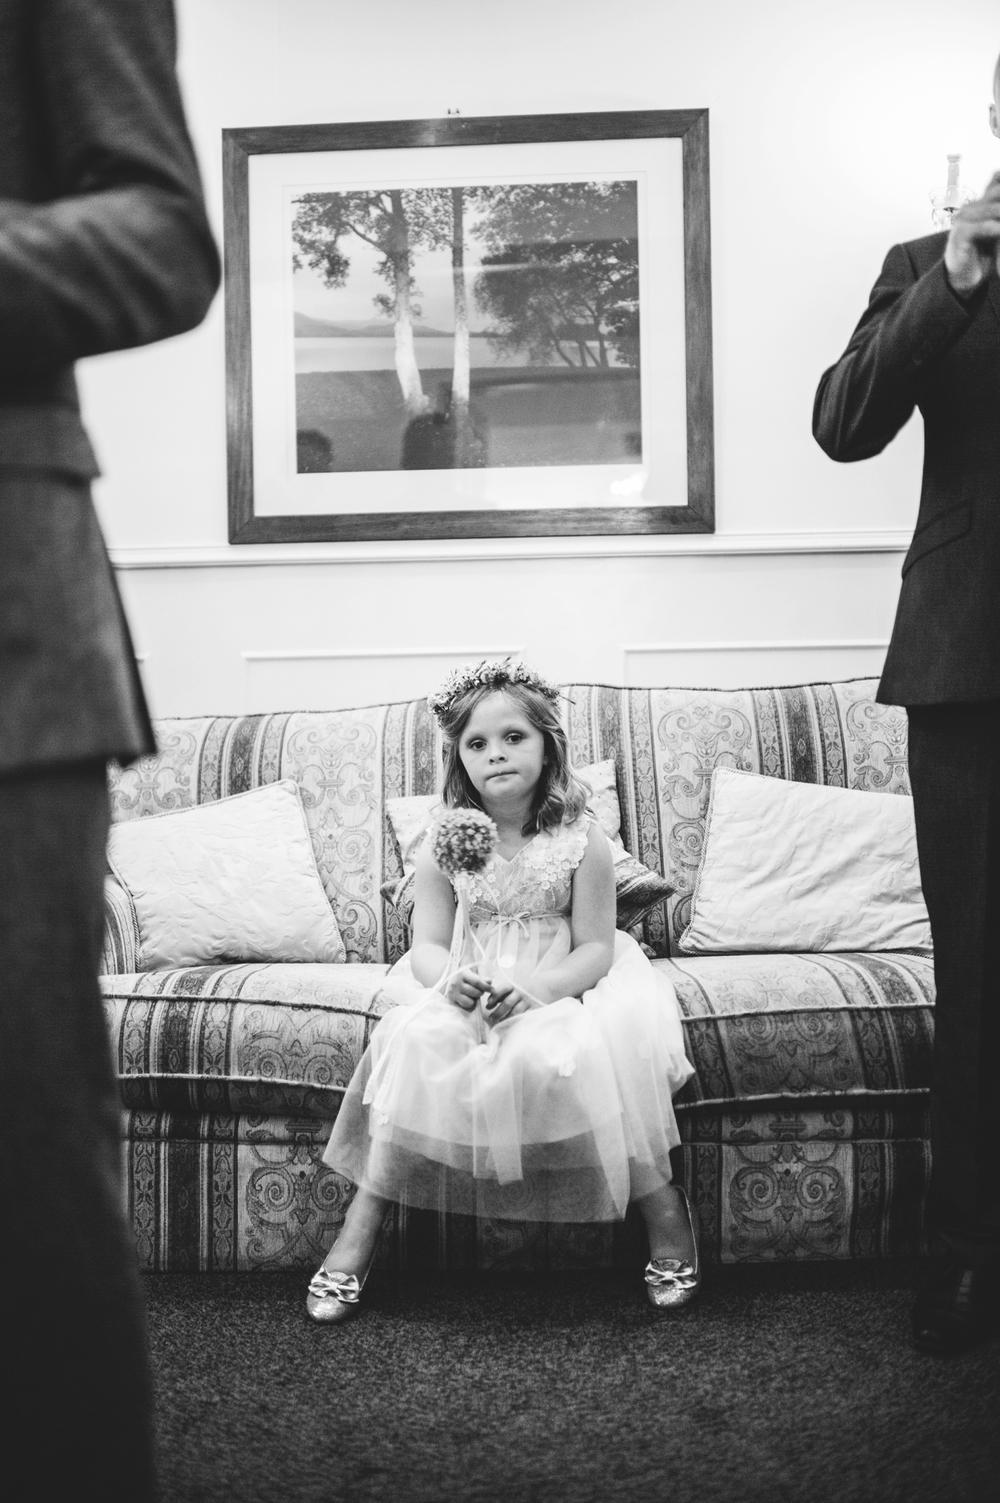 047-lisa-devine-photography-alternative-creative-wedding-photography-glasgow-scotland-uk.JPG